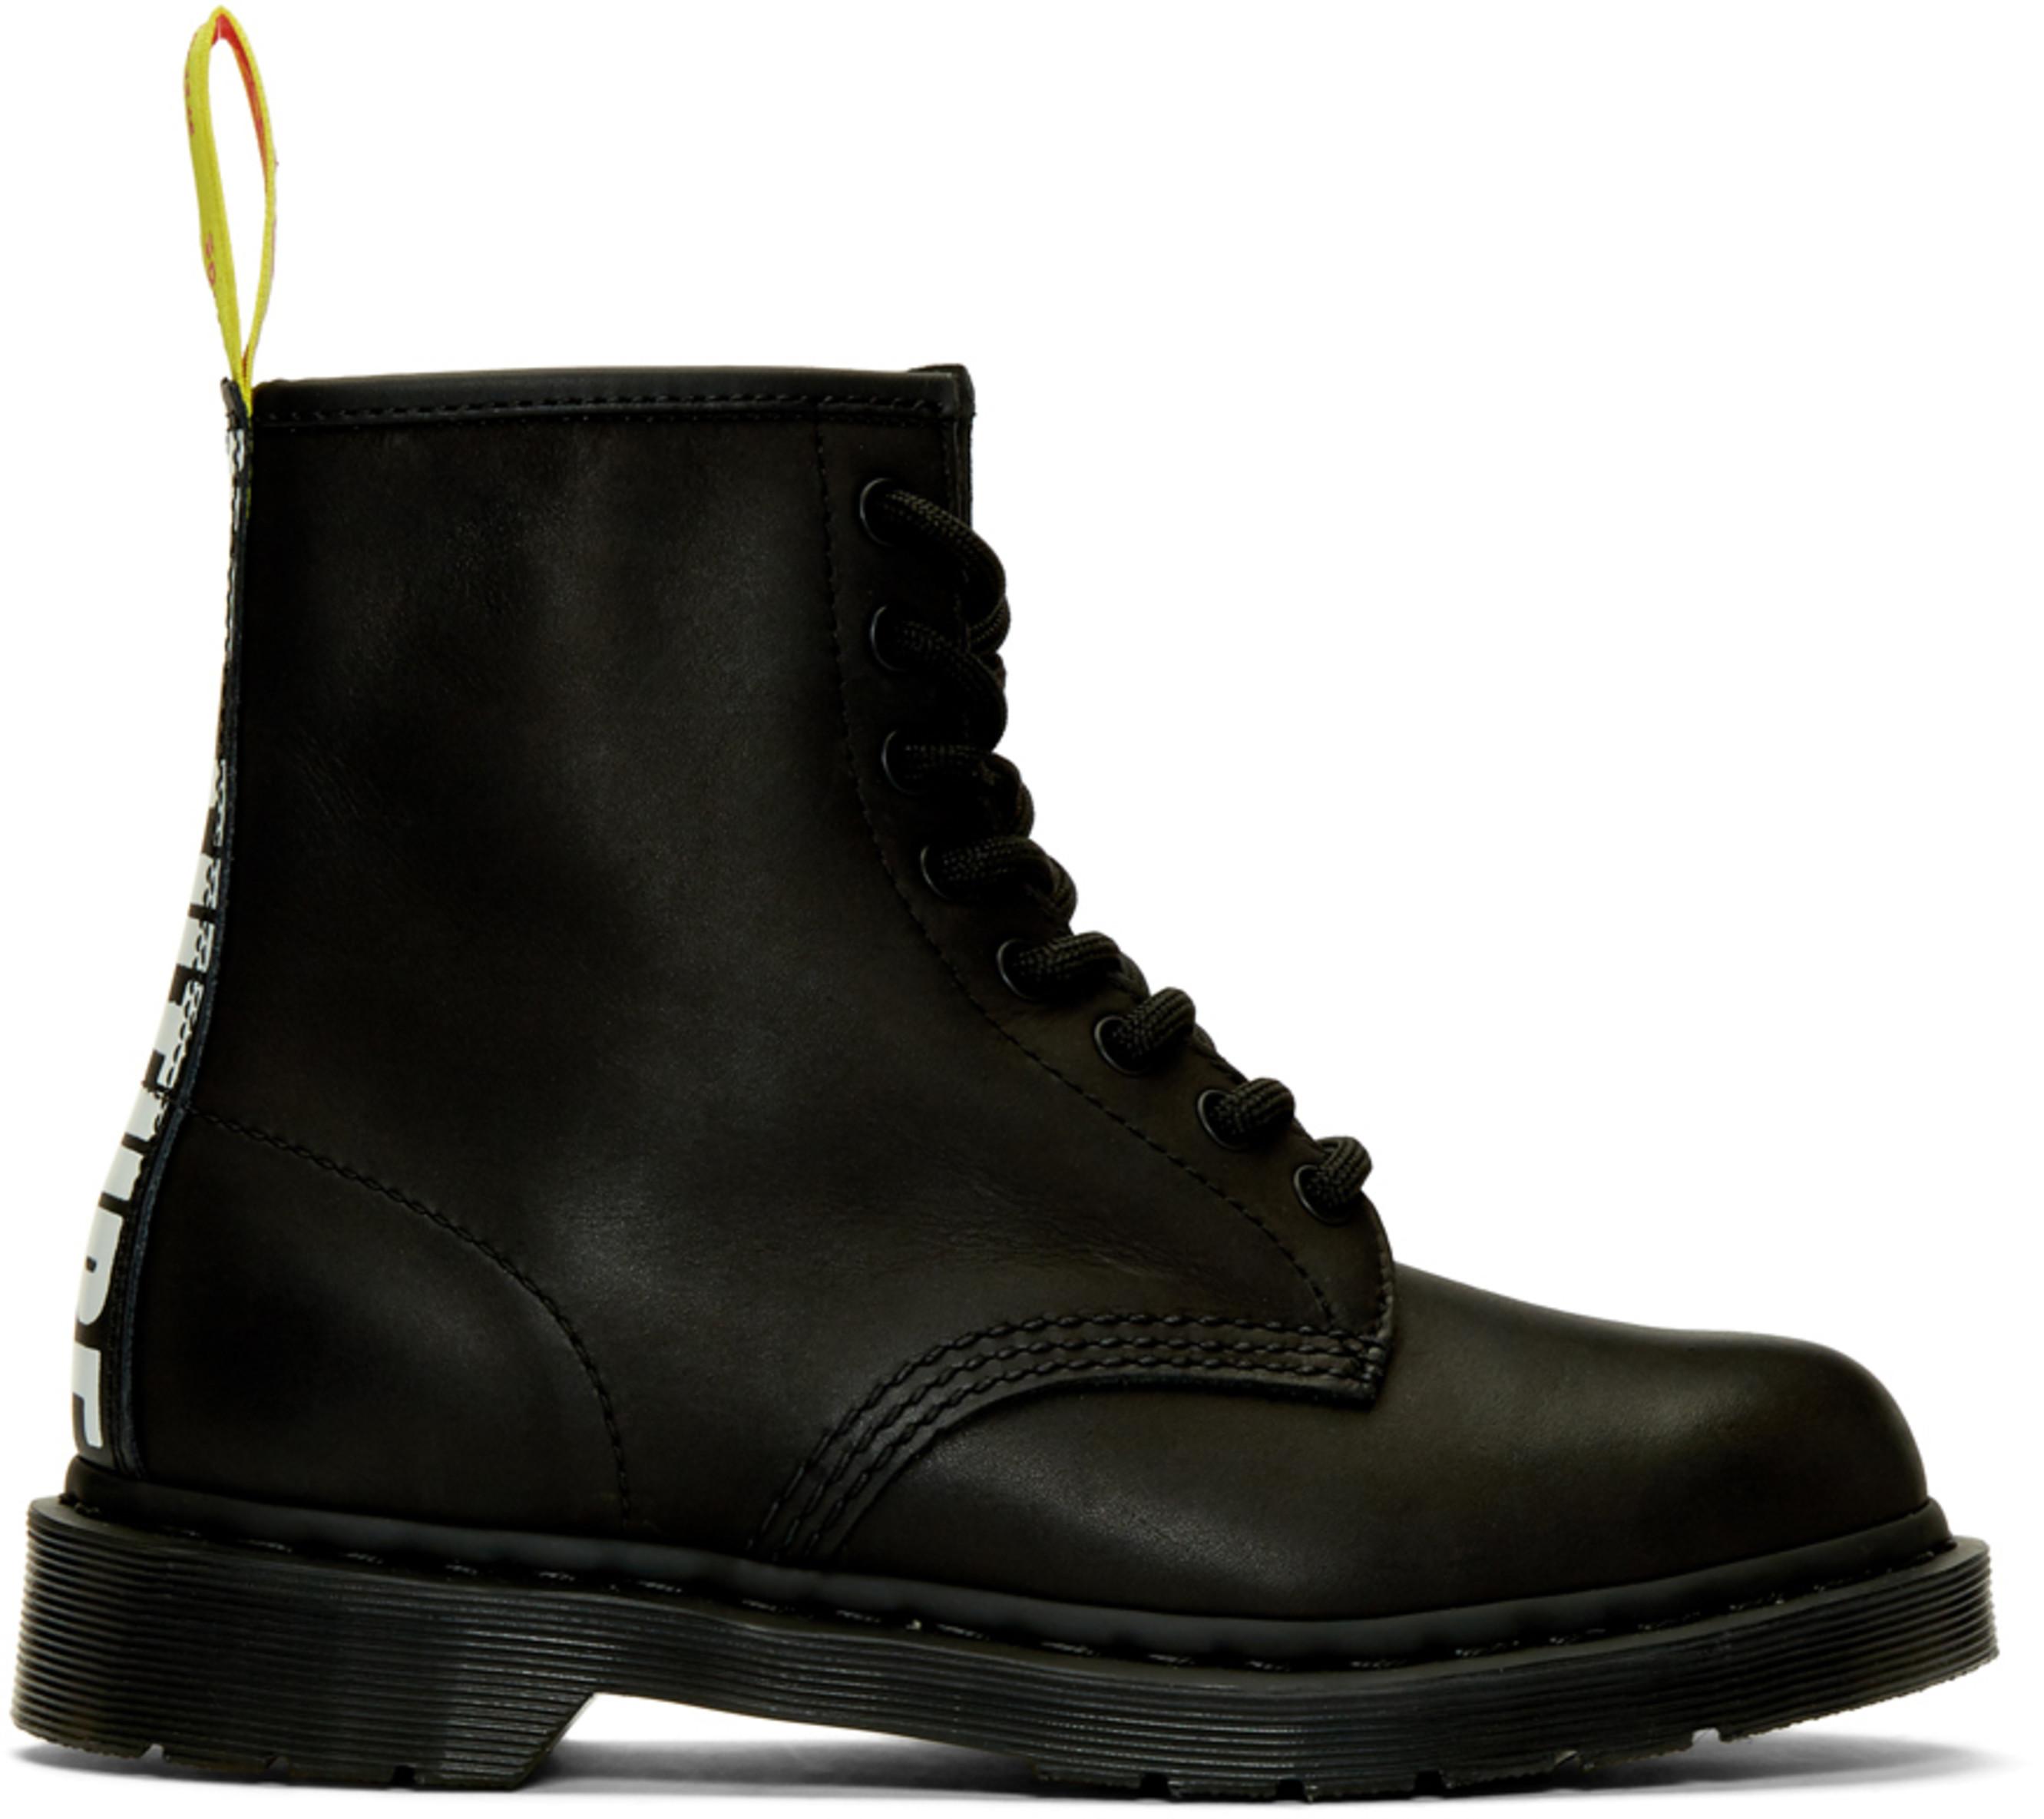 bdf33beb87e87 Designer boots for Men